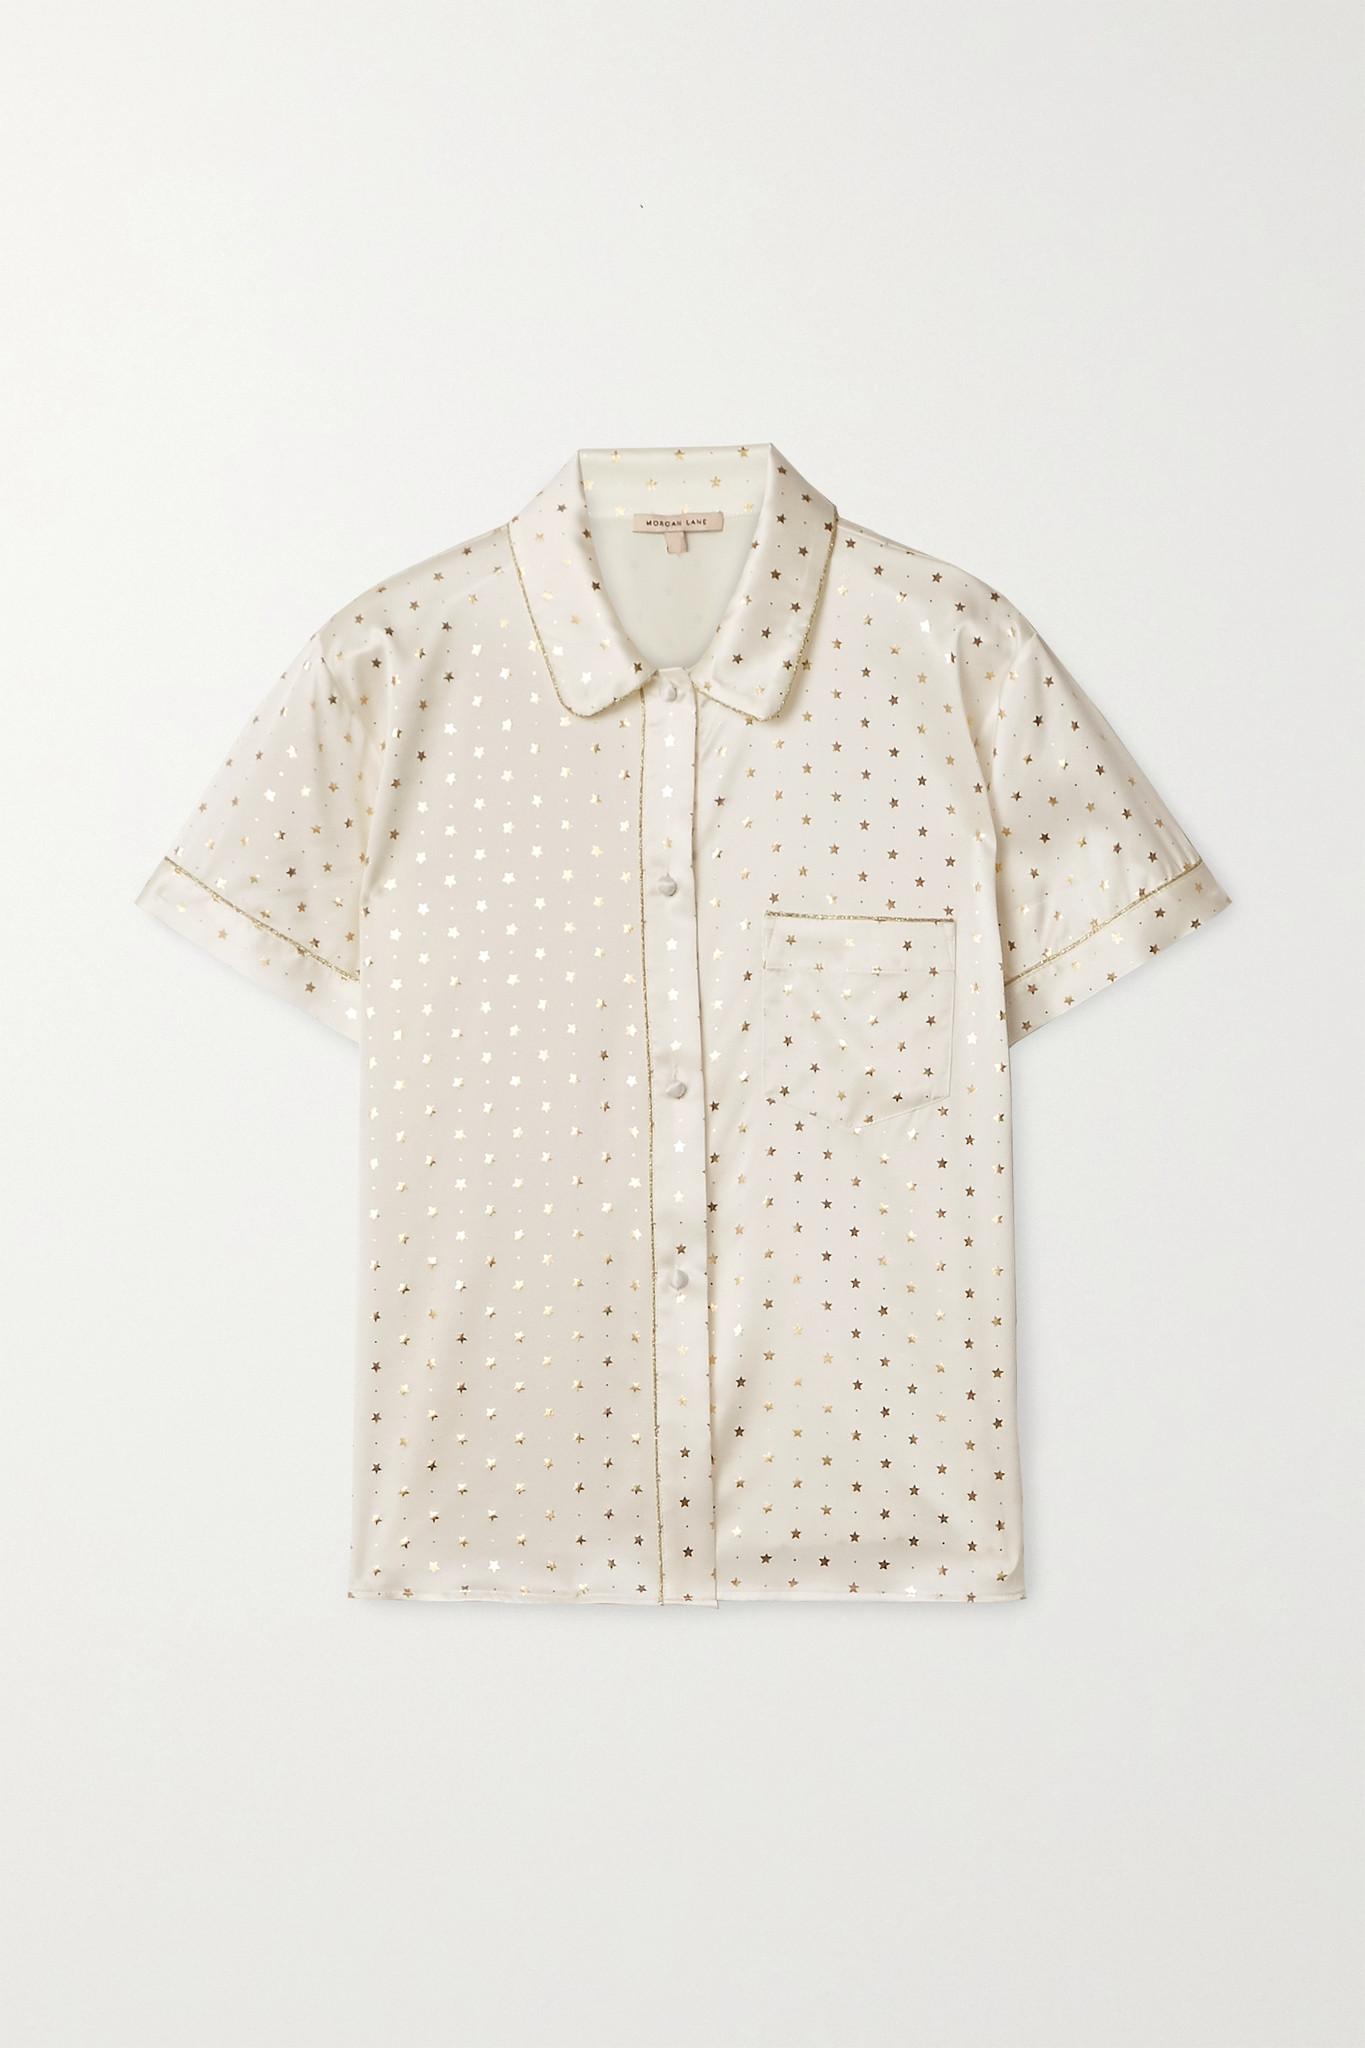 MORGAN LANE - Tami Metallic-trimmed Printed Silk-blend Satin Pajama Shirt - Ivory - x small